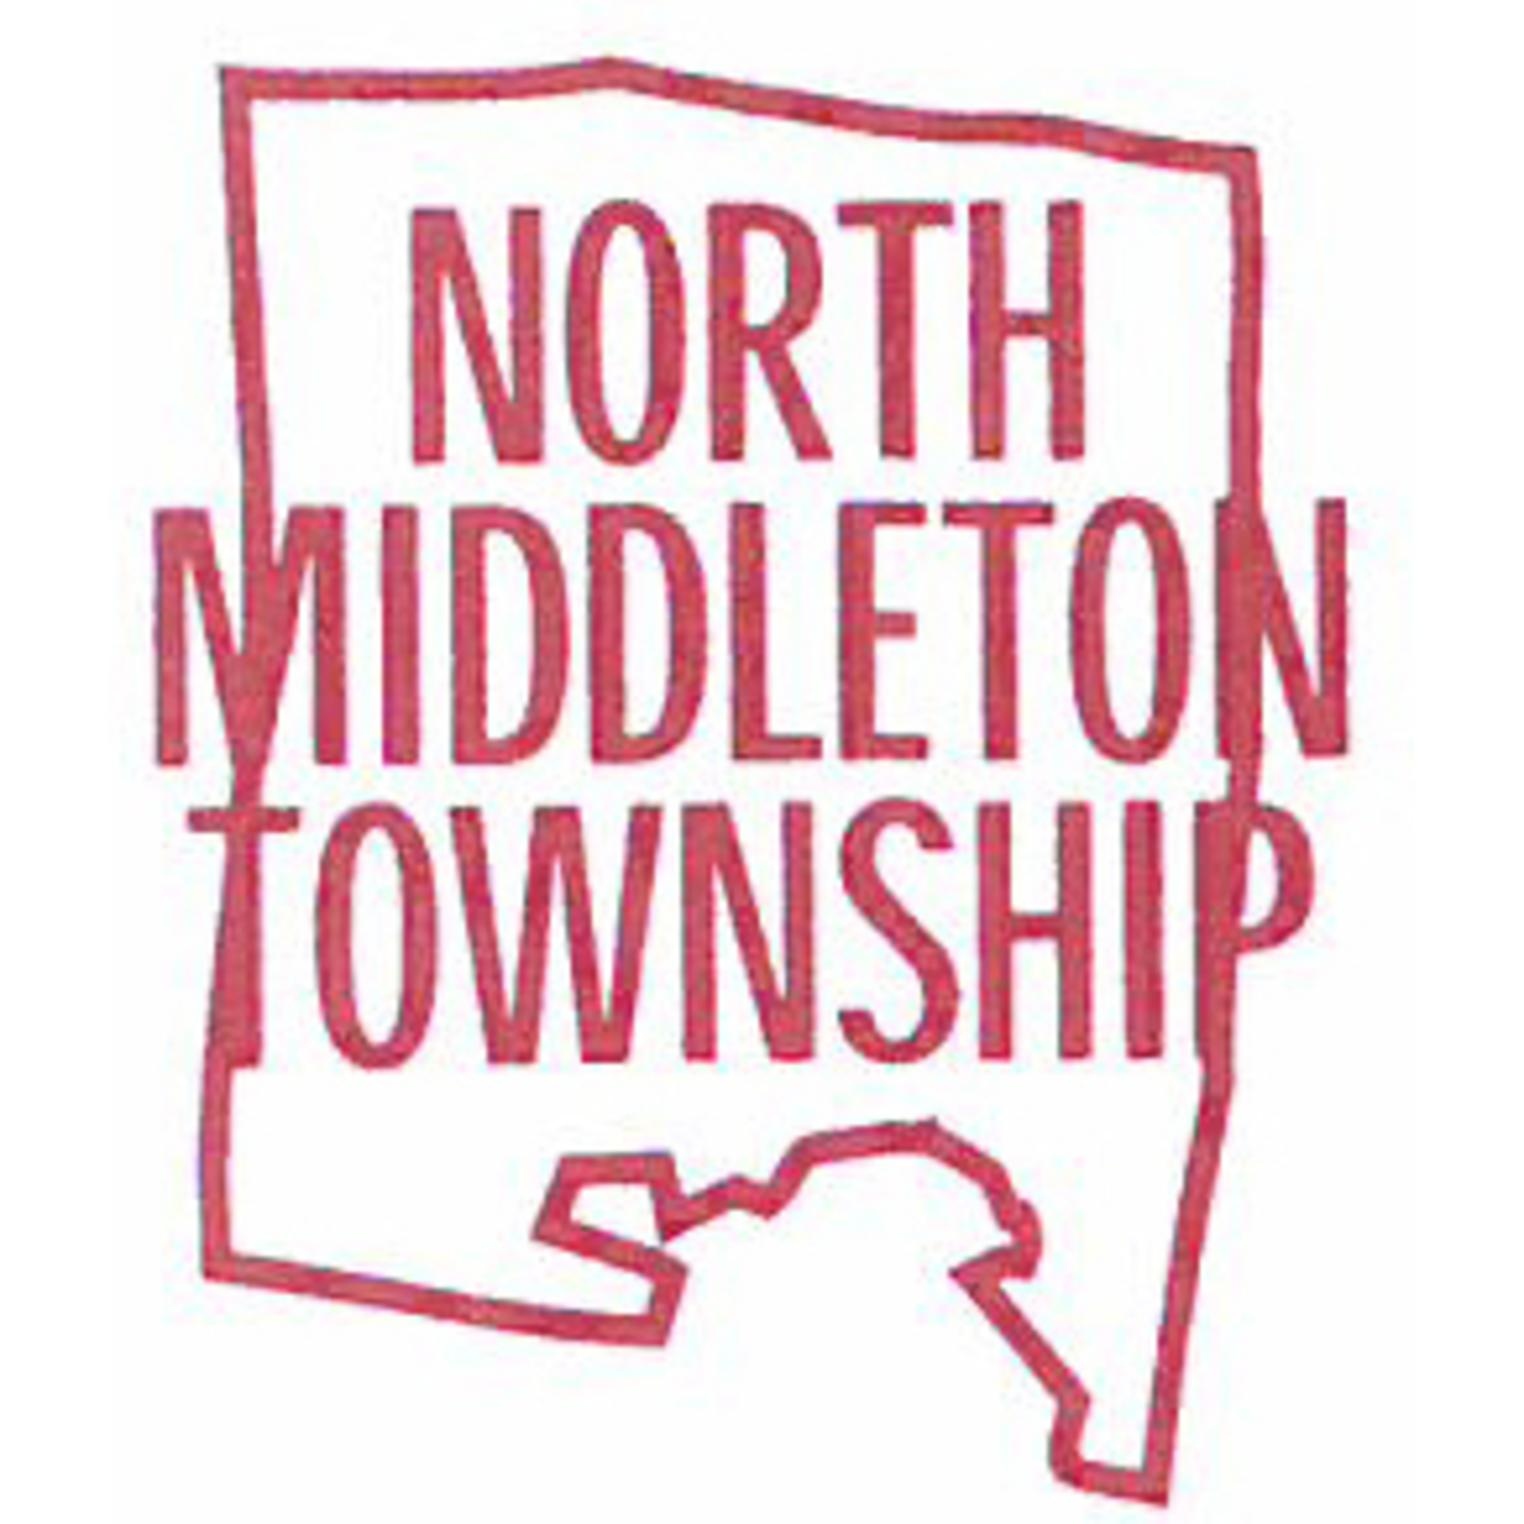 North Middleton Township